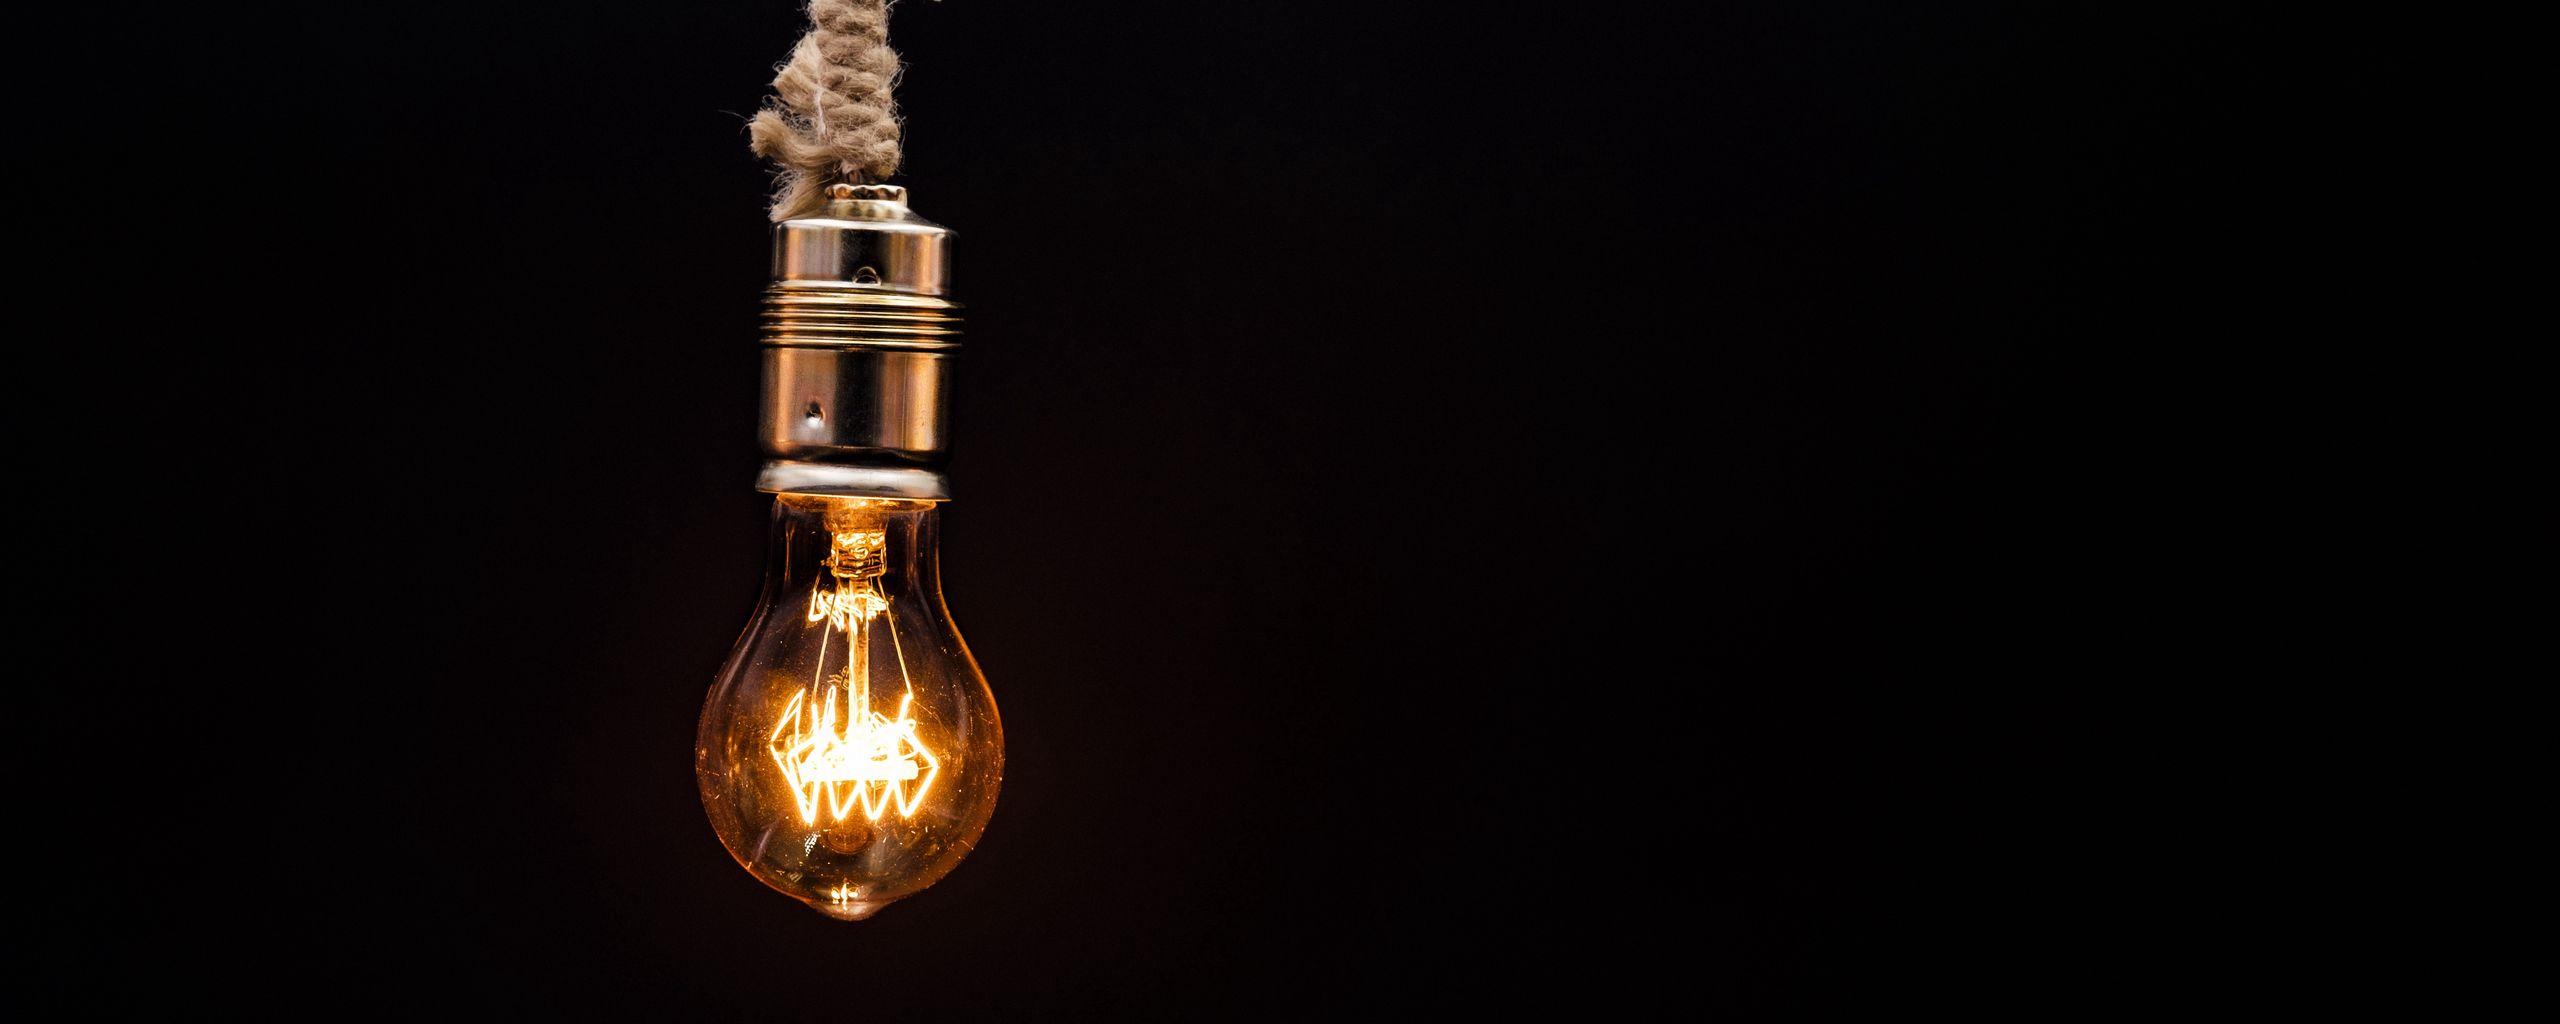 2560x1024 Wallpaper bulb, lighting, rope, electricity, edisons lamp